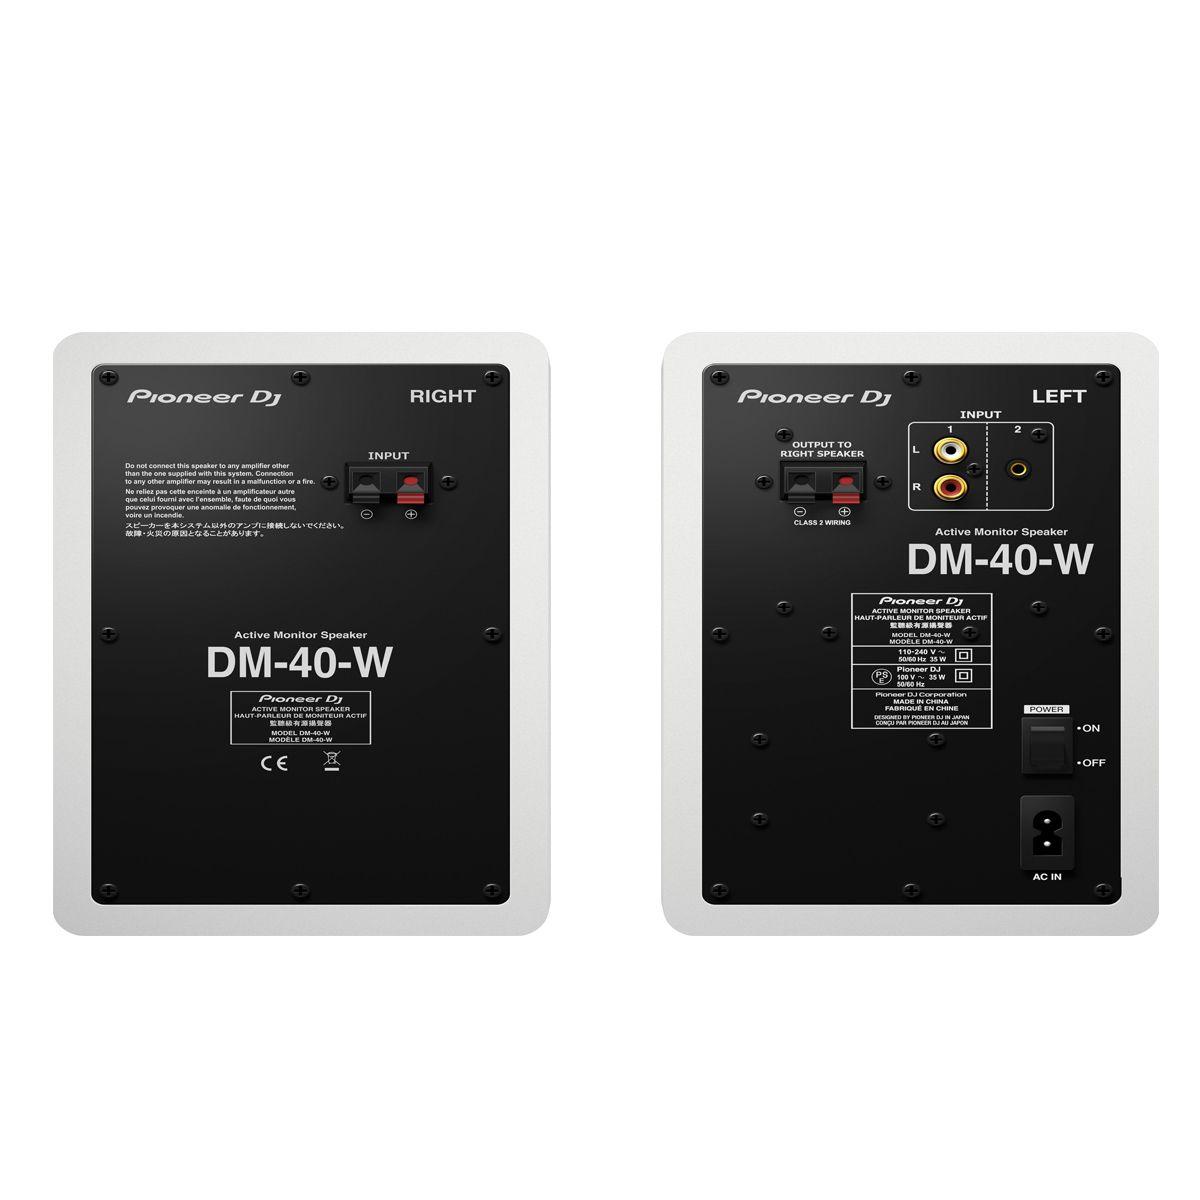 Monitor De Referência Pioneer Dj Dm-40